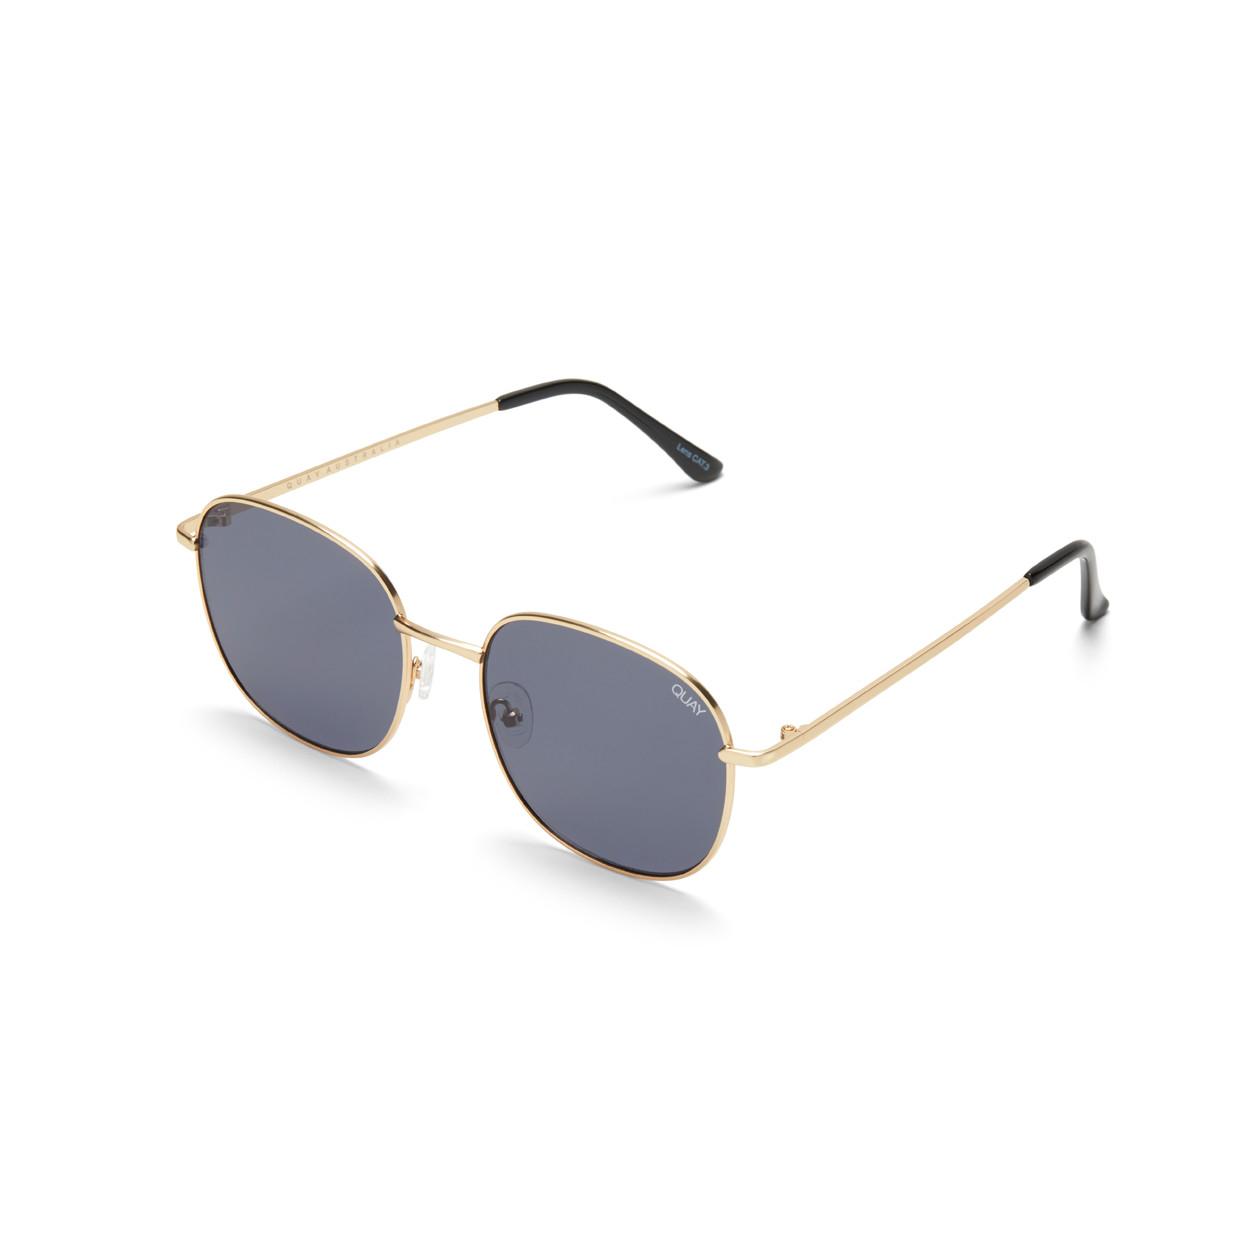 Jezabell aviator lunettes de soleil 9343963019919 - Quay - Modalova